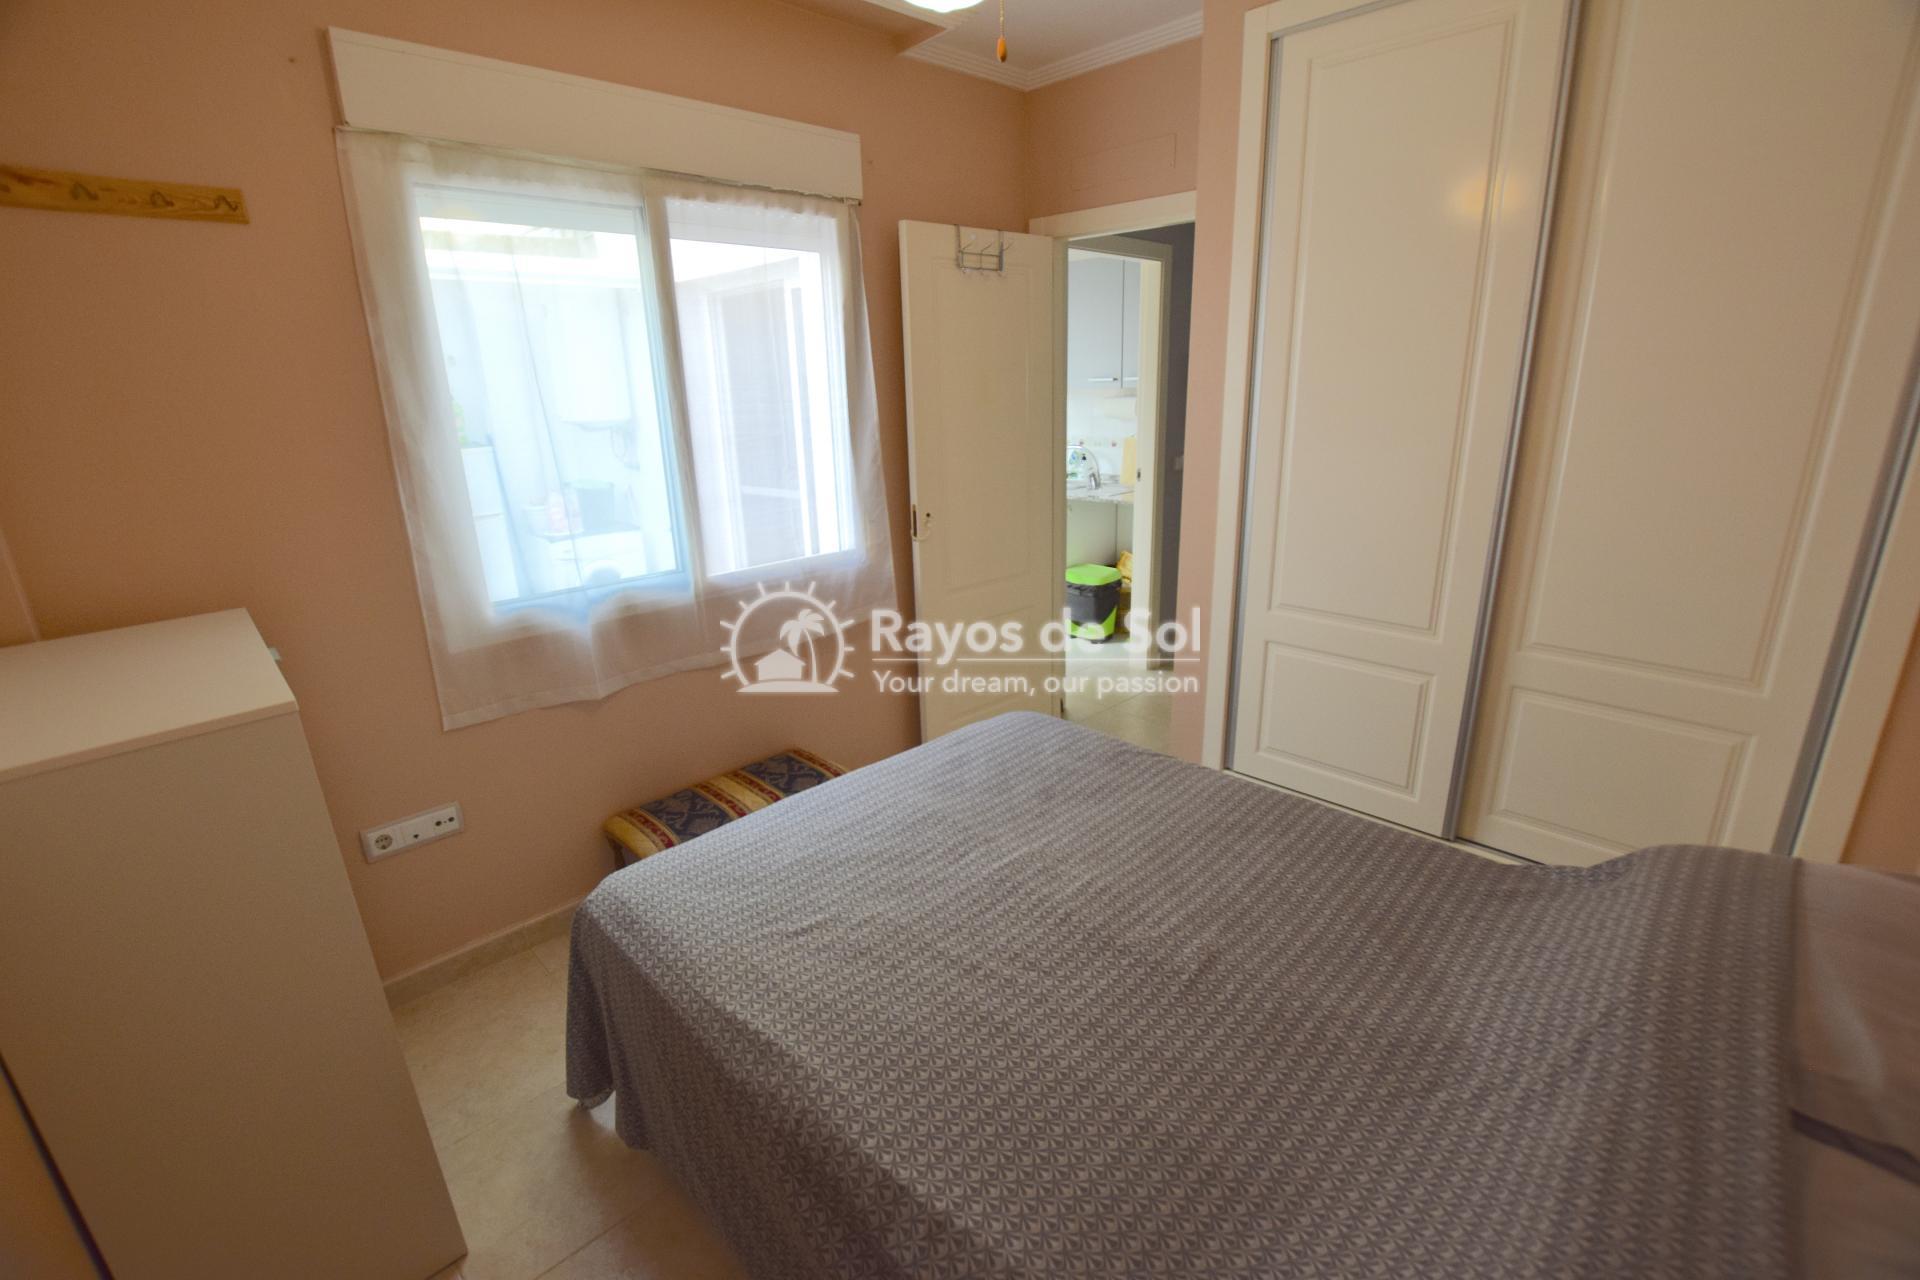 Appartement met zuidwest oriëntatie  in San Cayetano, Costa Cálida (SCRE0055) - 18